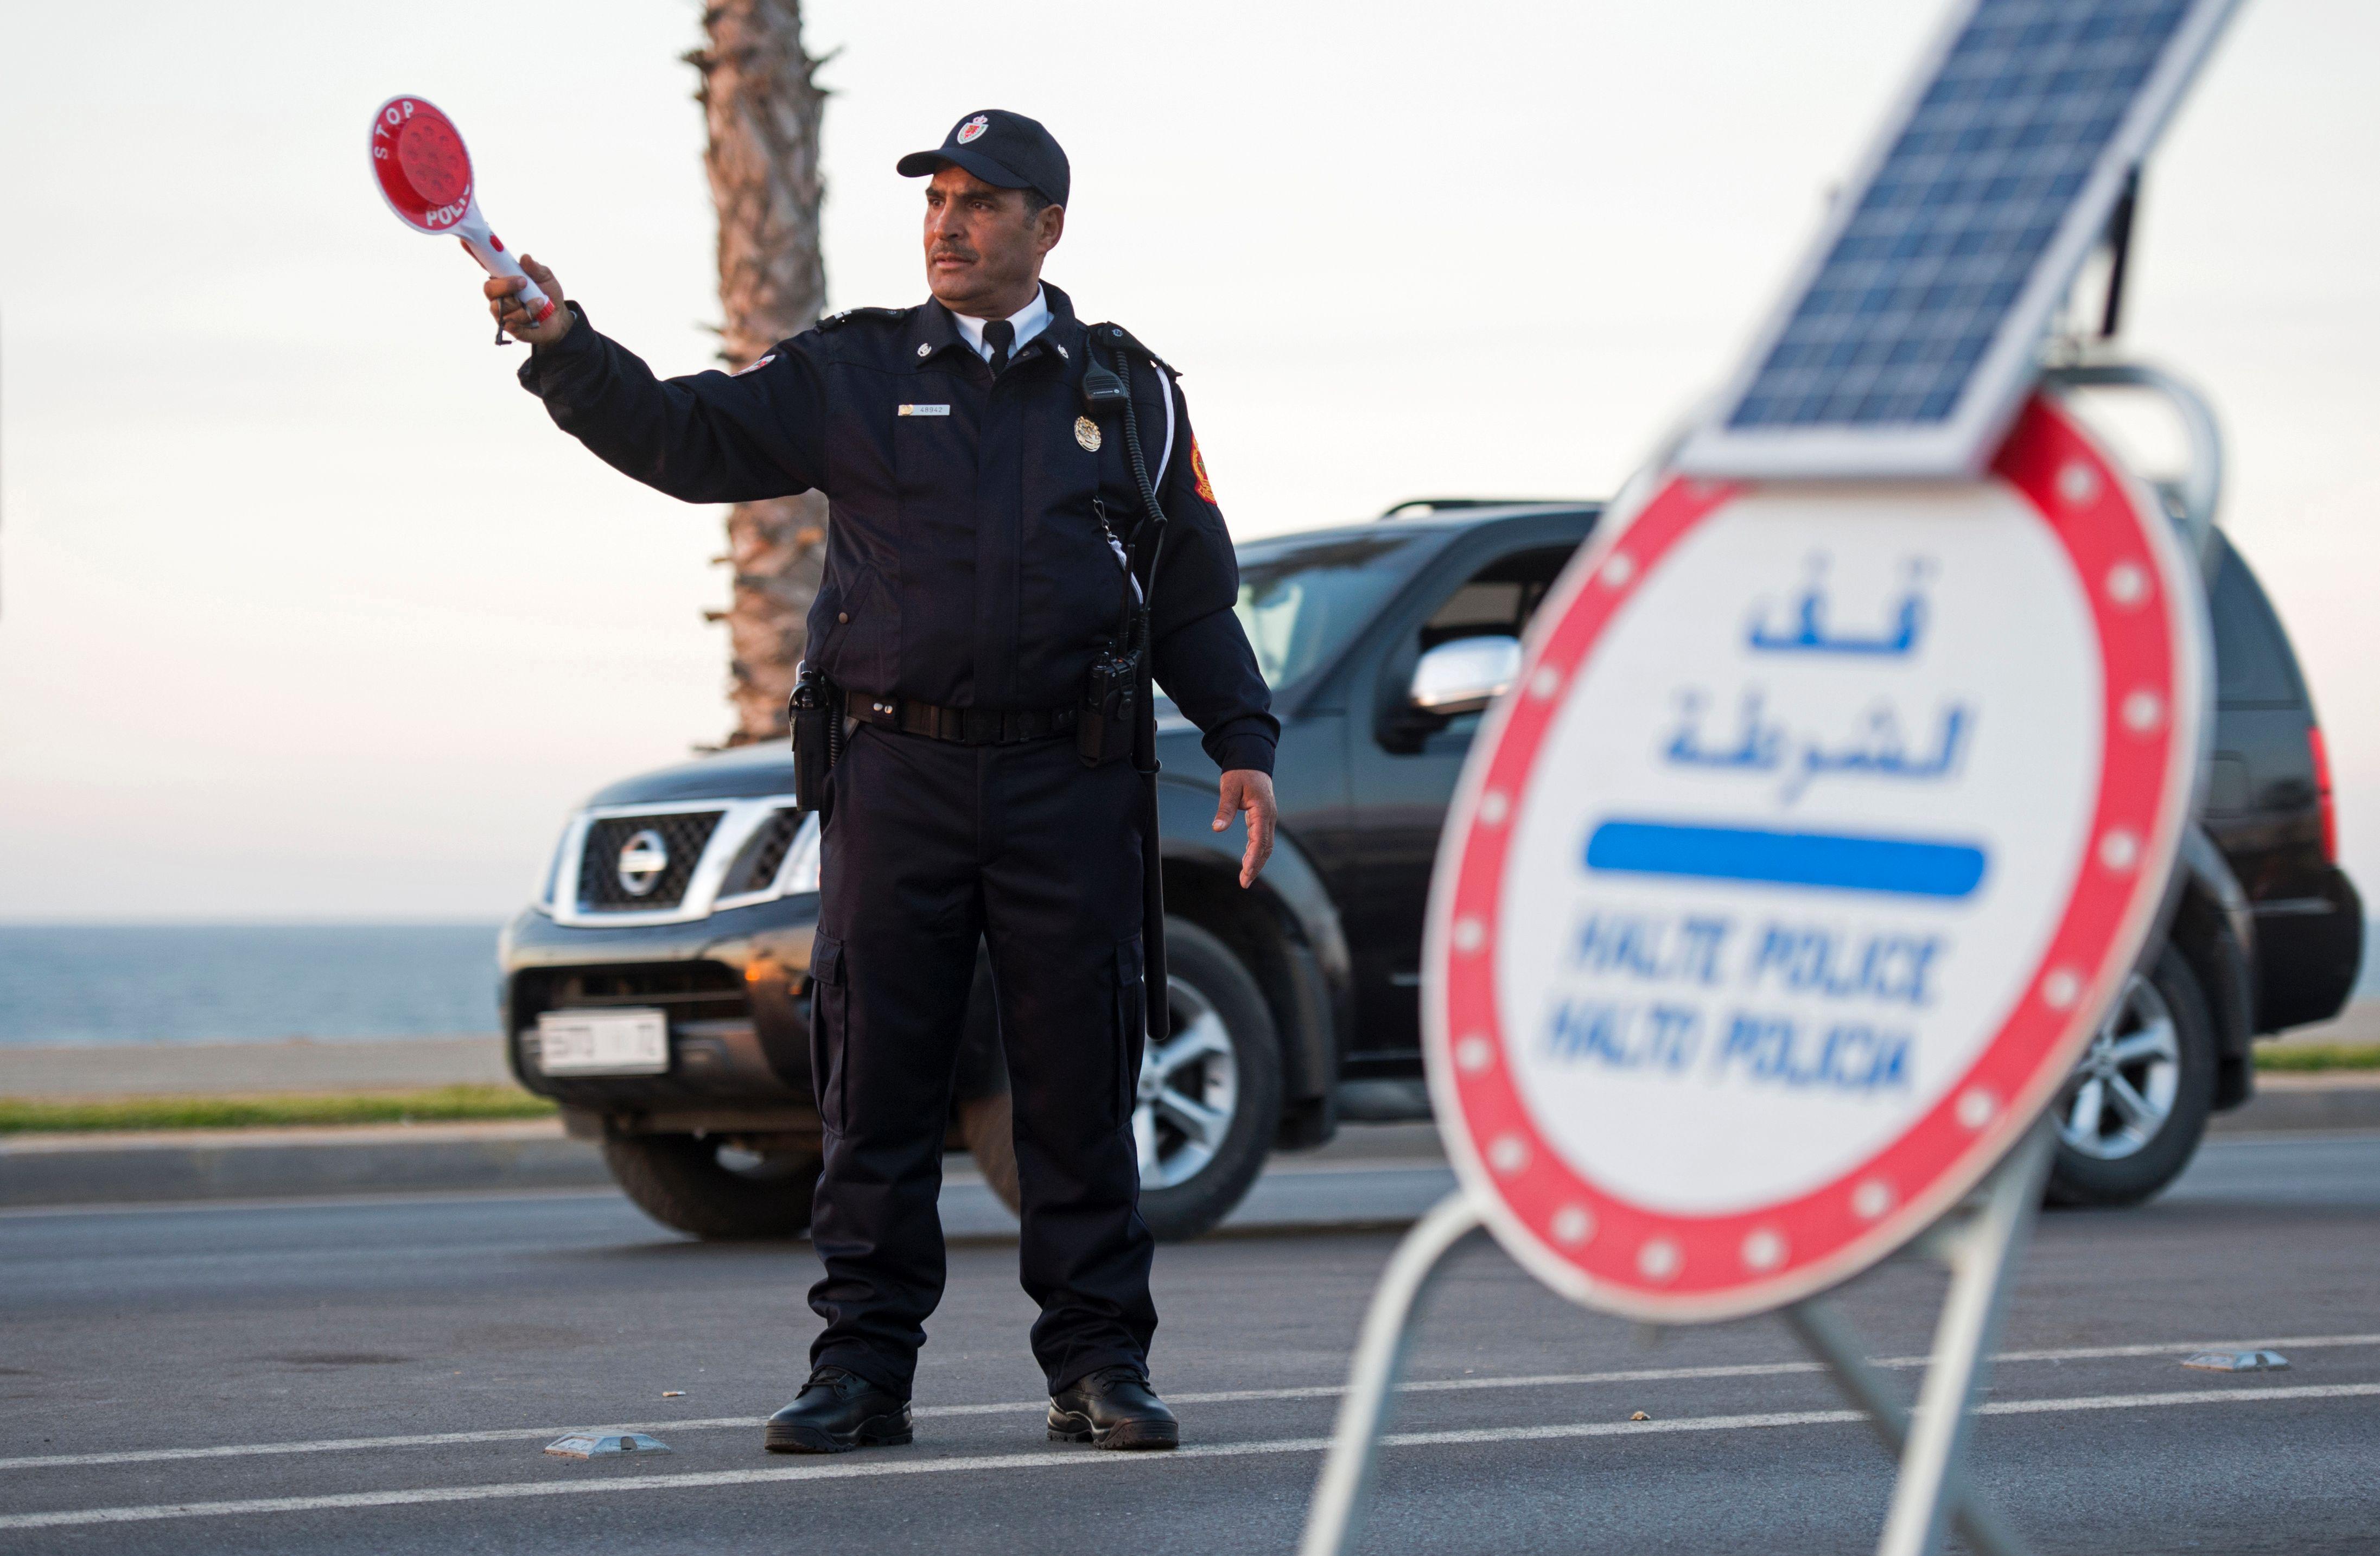 tout sur la police - Page 10 1019210-شرطى-مغربى-فى-زيه-الجديد